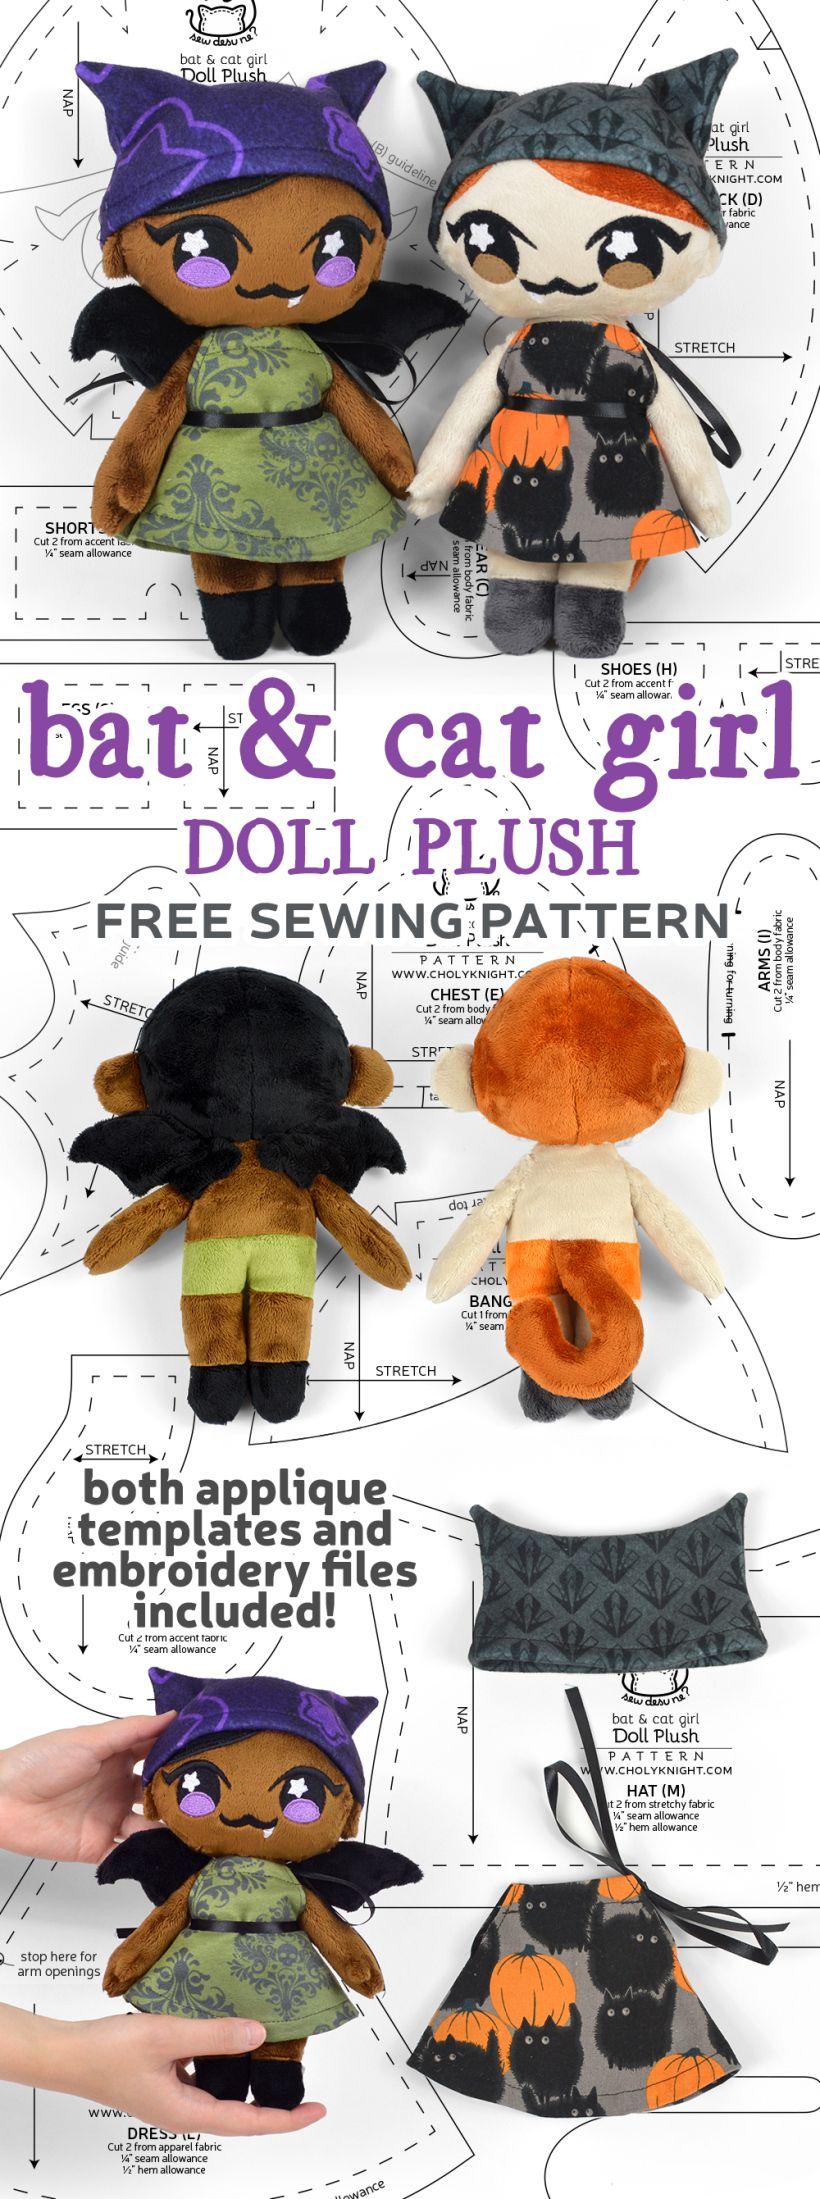 Cat 5 Bat